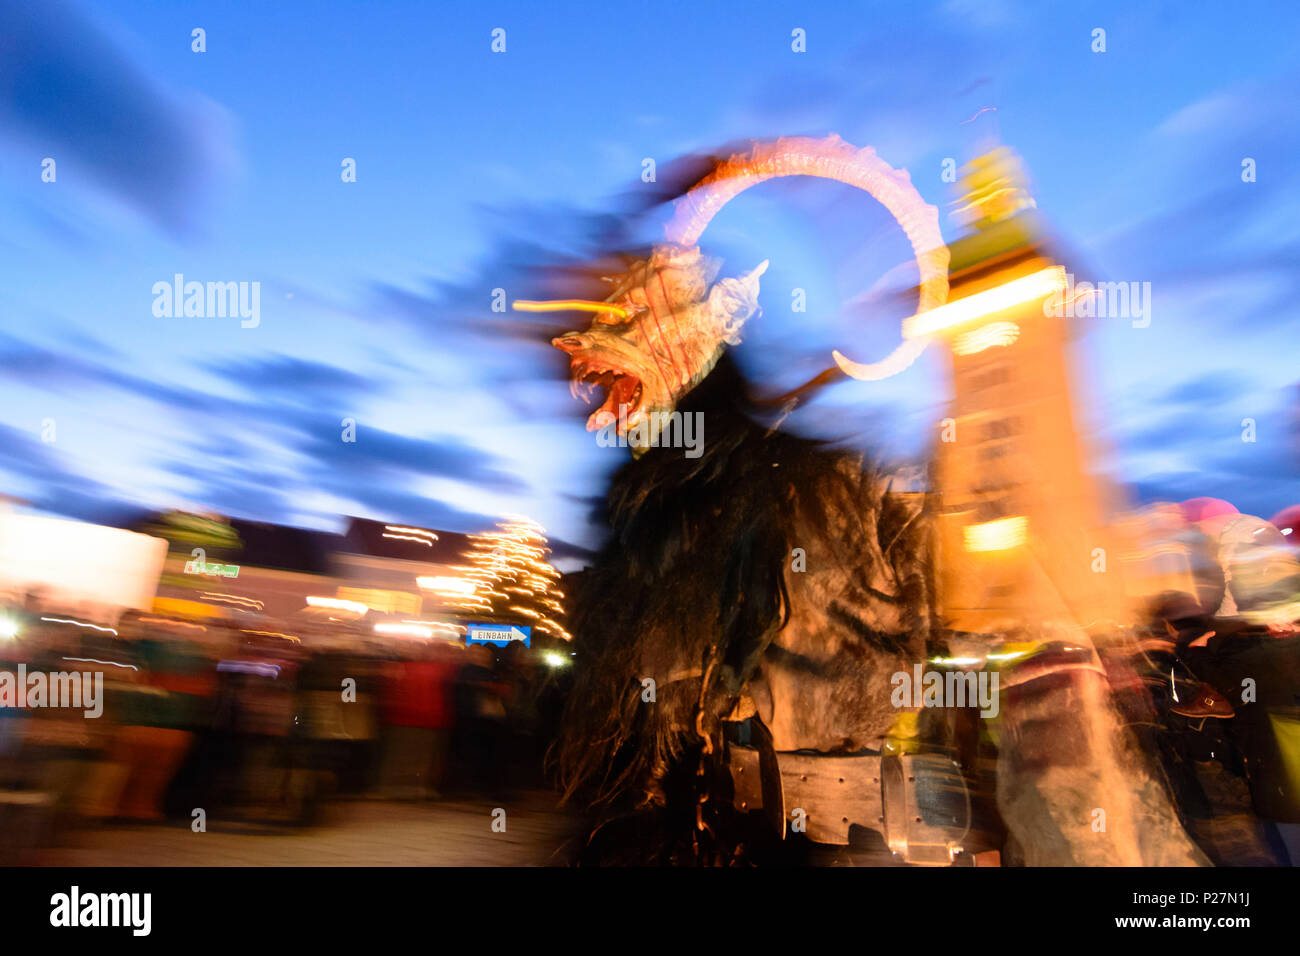 Hauptlauf Stockfotos & Hauptlauf Bilder - Alamy